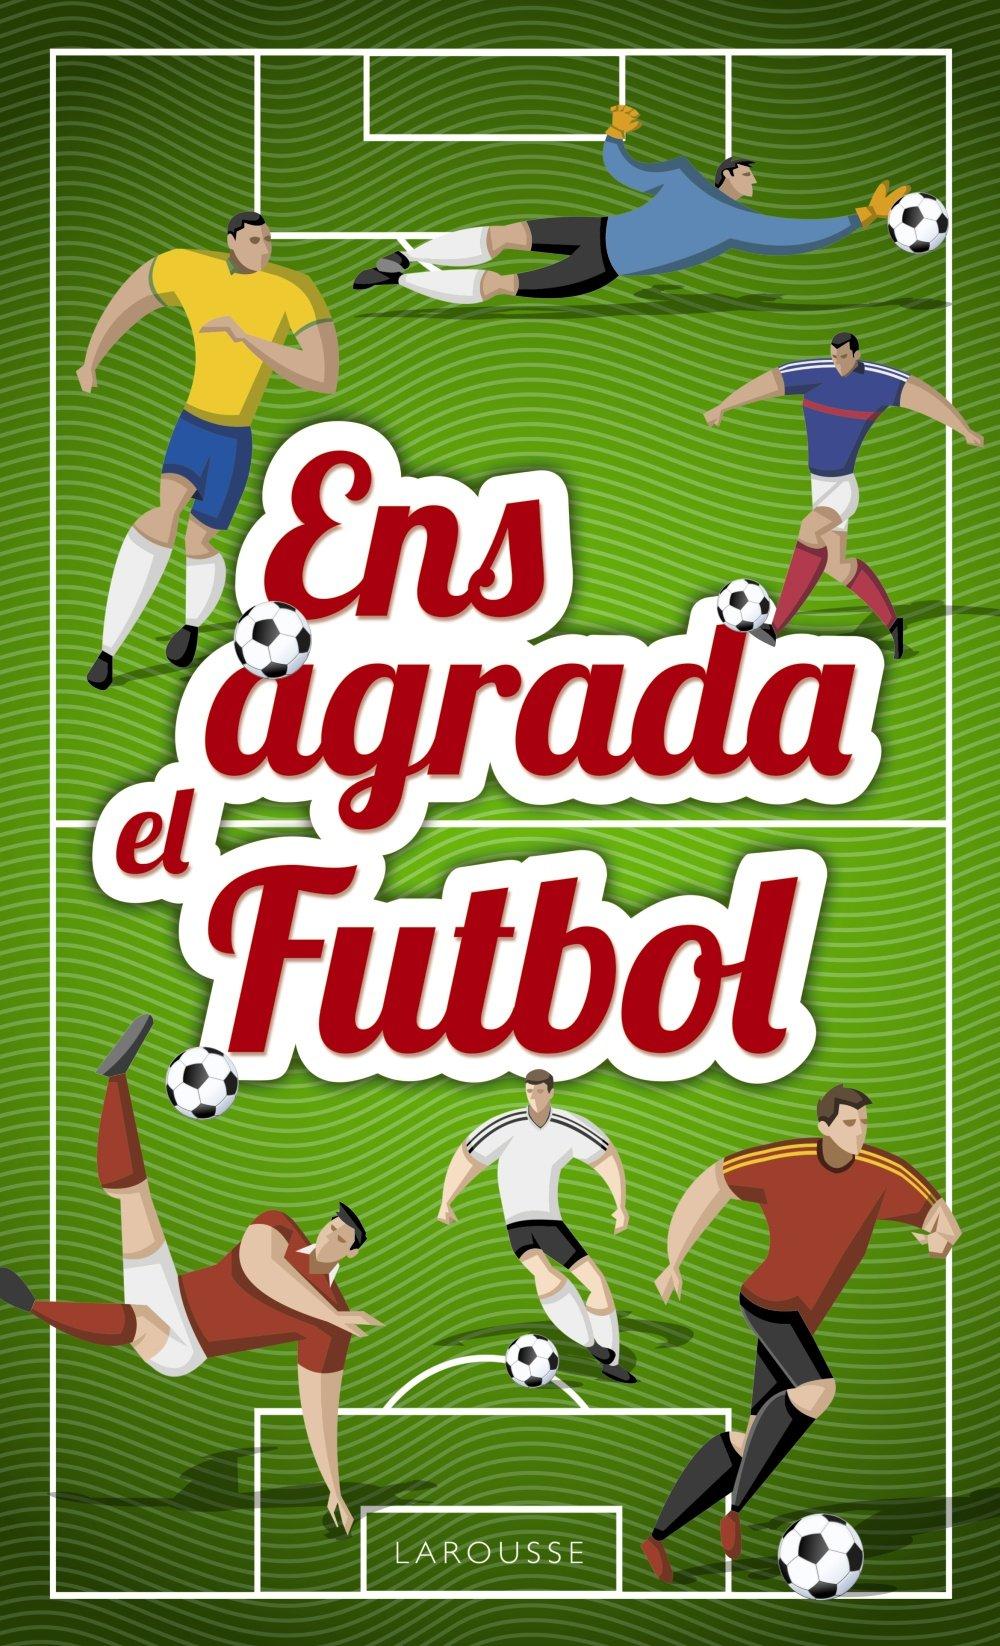 Ens agrada el futbol Larousse - Infantil / Juvenil - Catalán ...